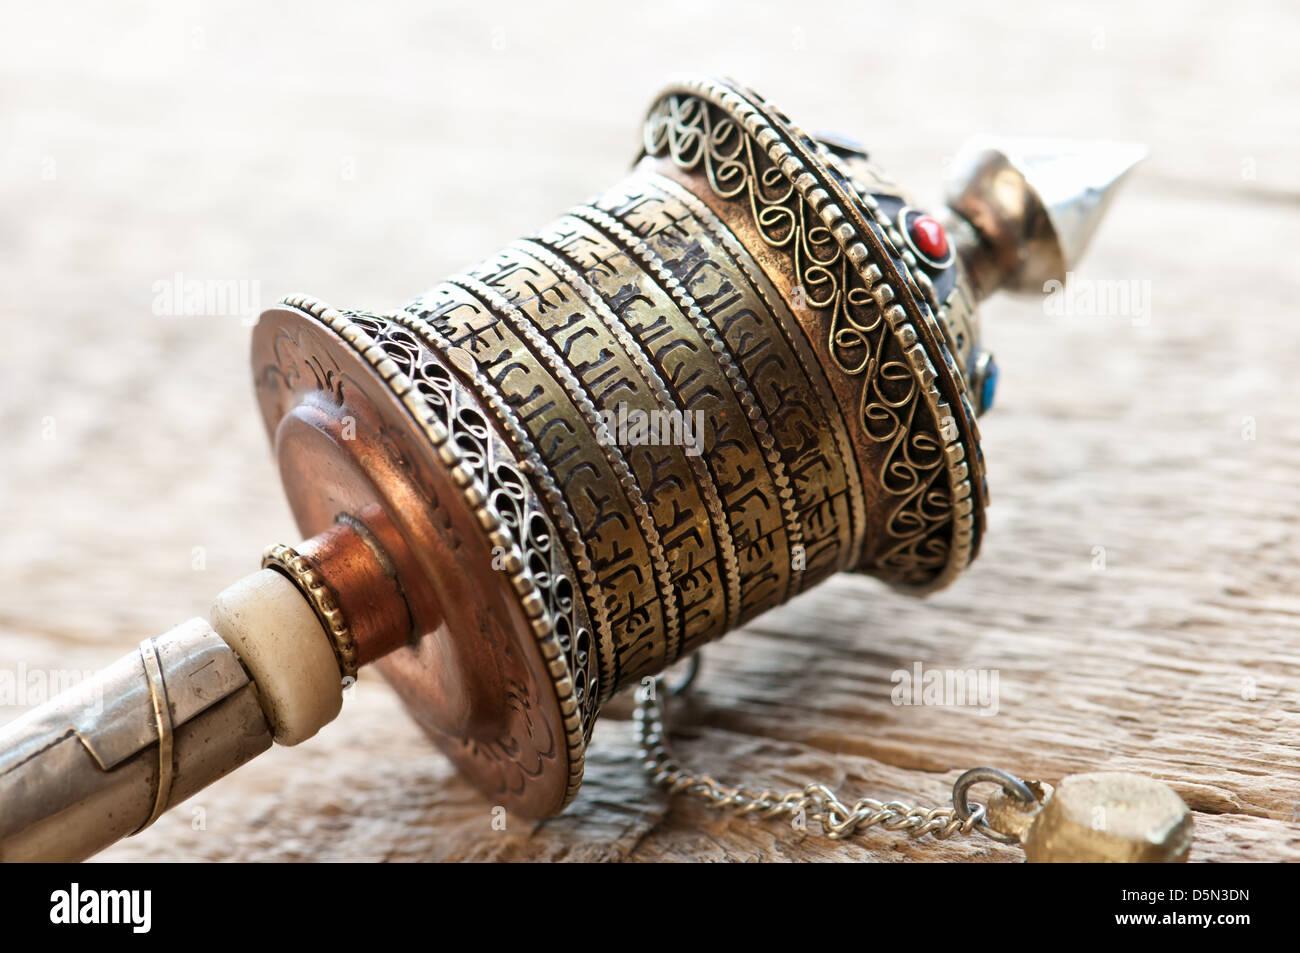 gold tibetan spool on table - Stock Image